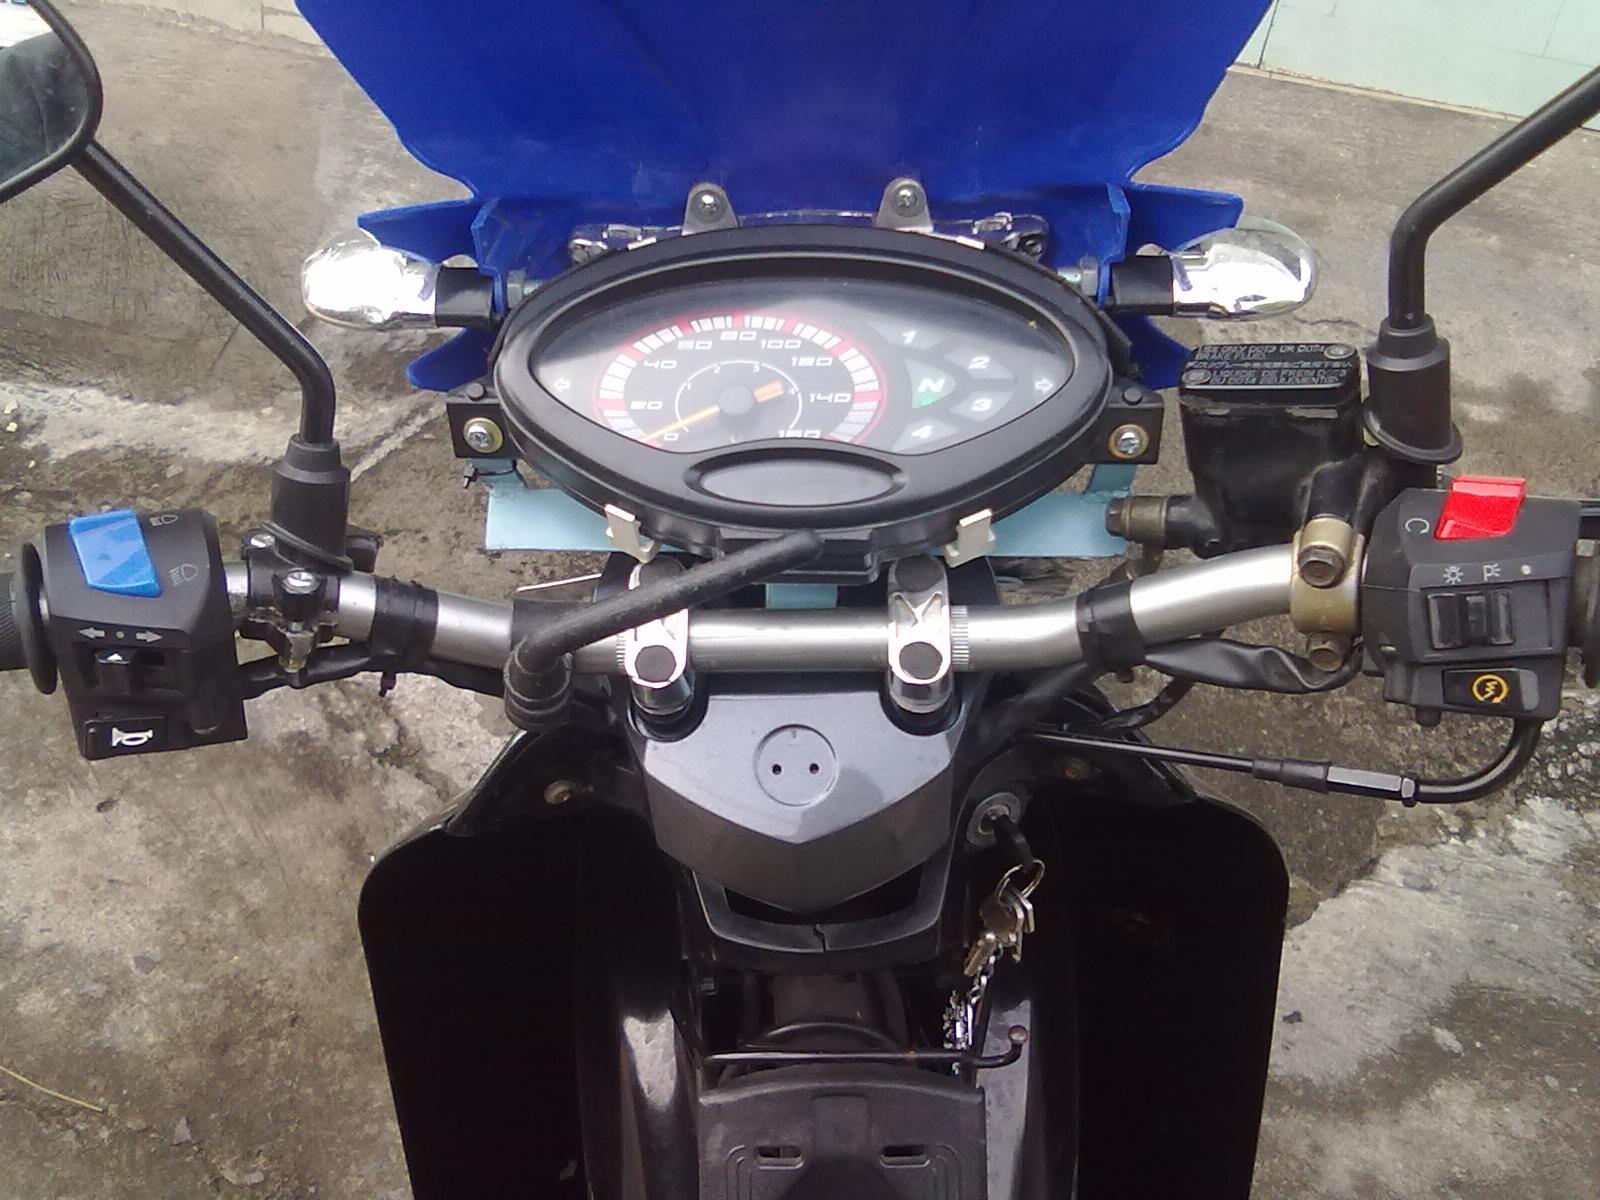 Modifikasi Vario Stang Byson Kumpulan Modifikasi Motor Vario